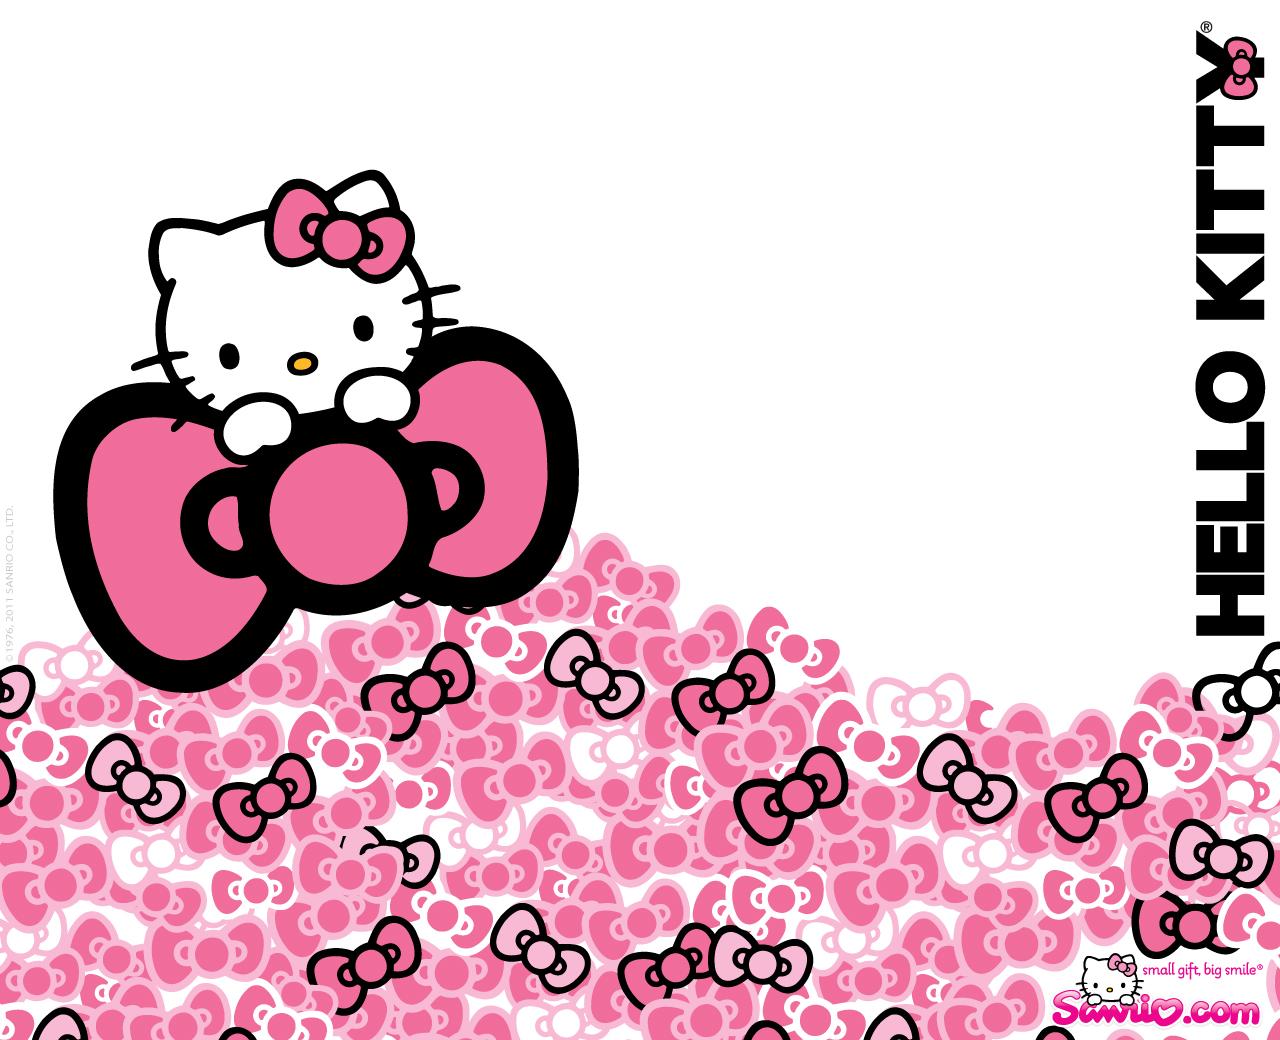 Namn:  Hello-kitty-Wallpapers-From-Sanrio-Website.jpg Visningar: 815 Storlek:  621.8 KB